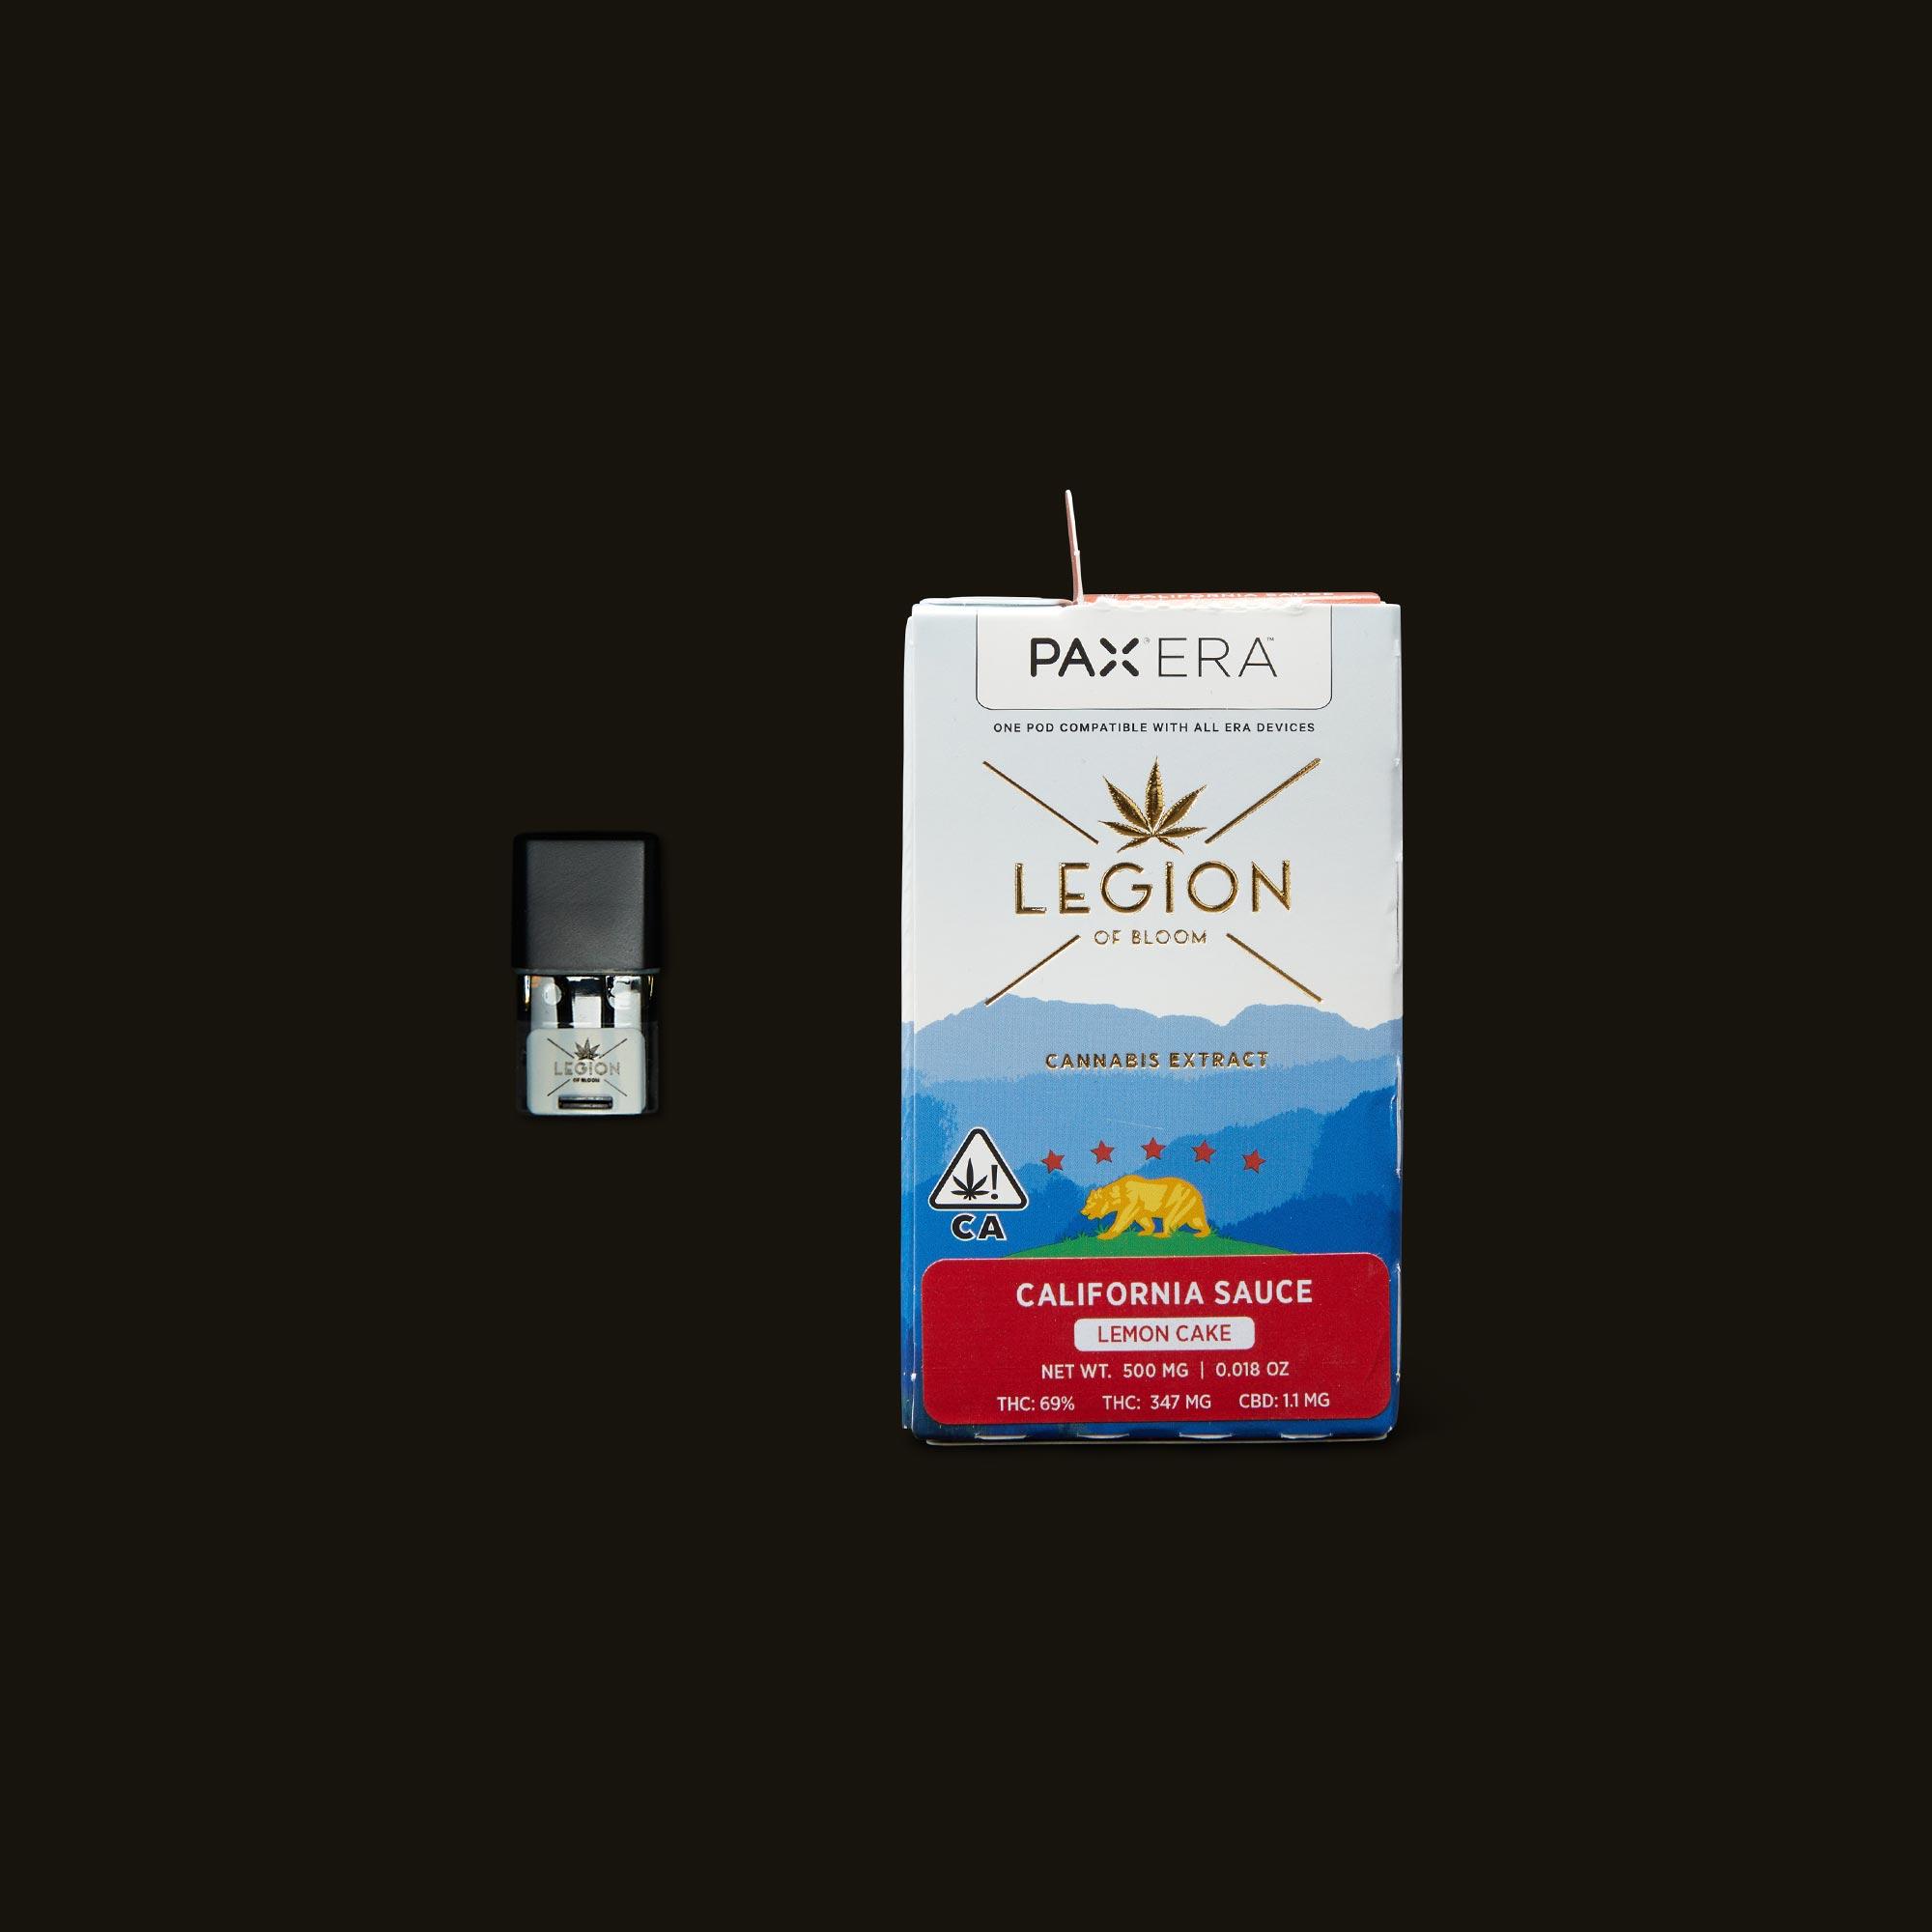 Legion of Bloom Lemon Cake California Sauce PAX Era Pod